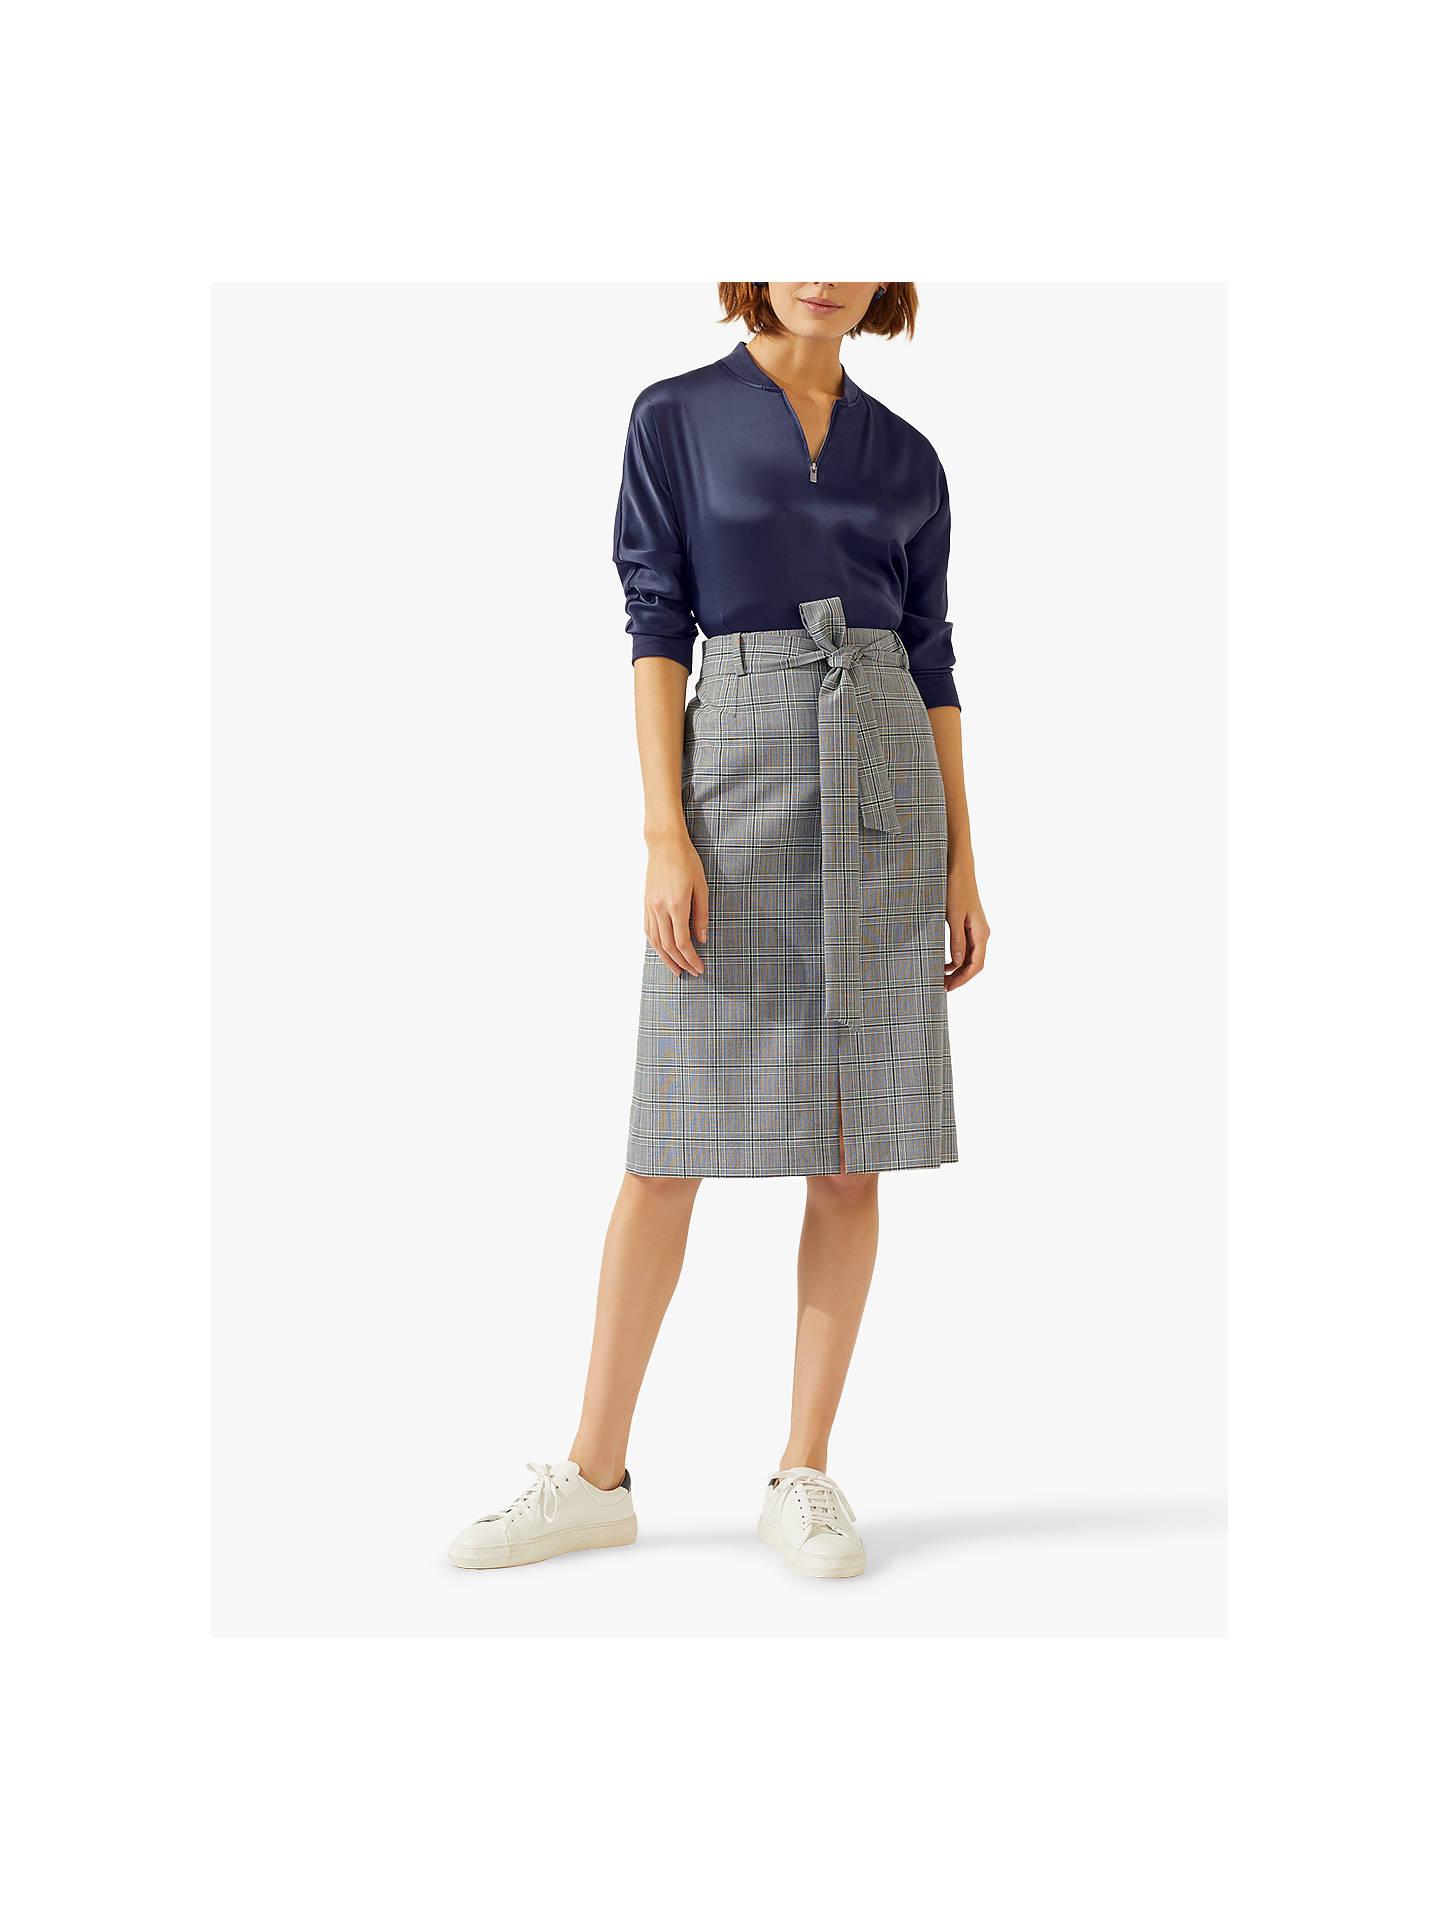 8e8cbbc12d81 ... Buy Jigsaw Monochrome Check Midi Skirt, Multi, 8 Online at  johnlewis.com ...